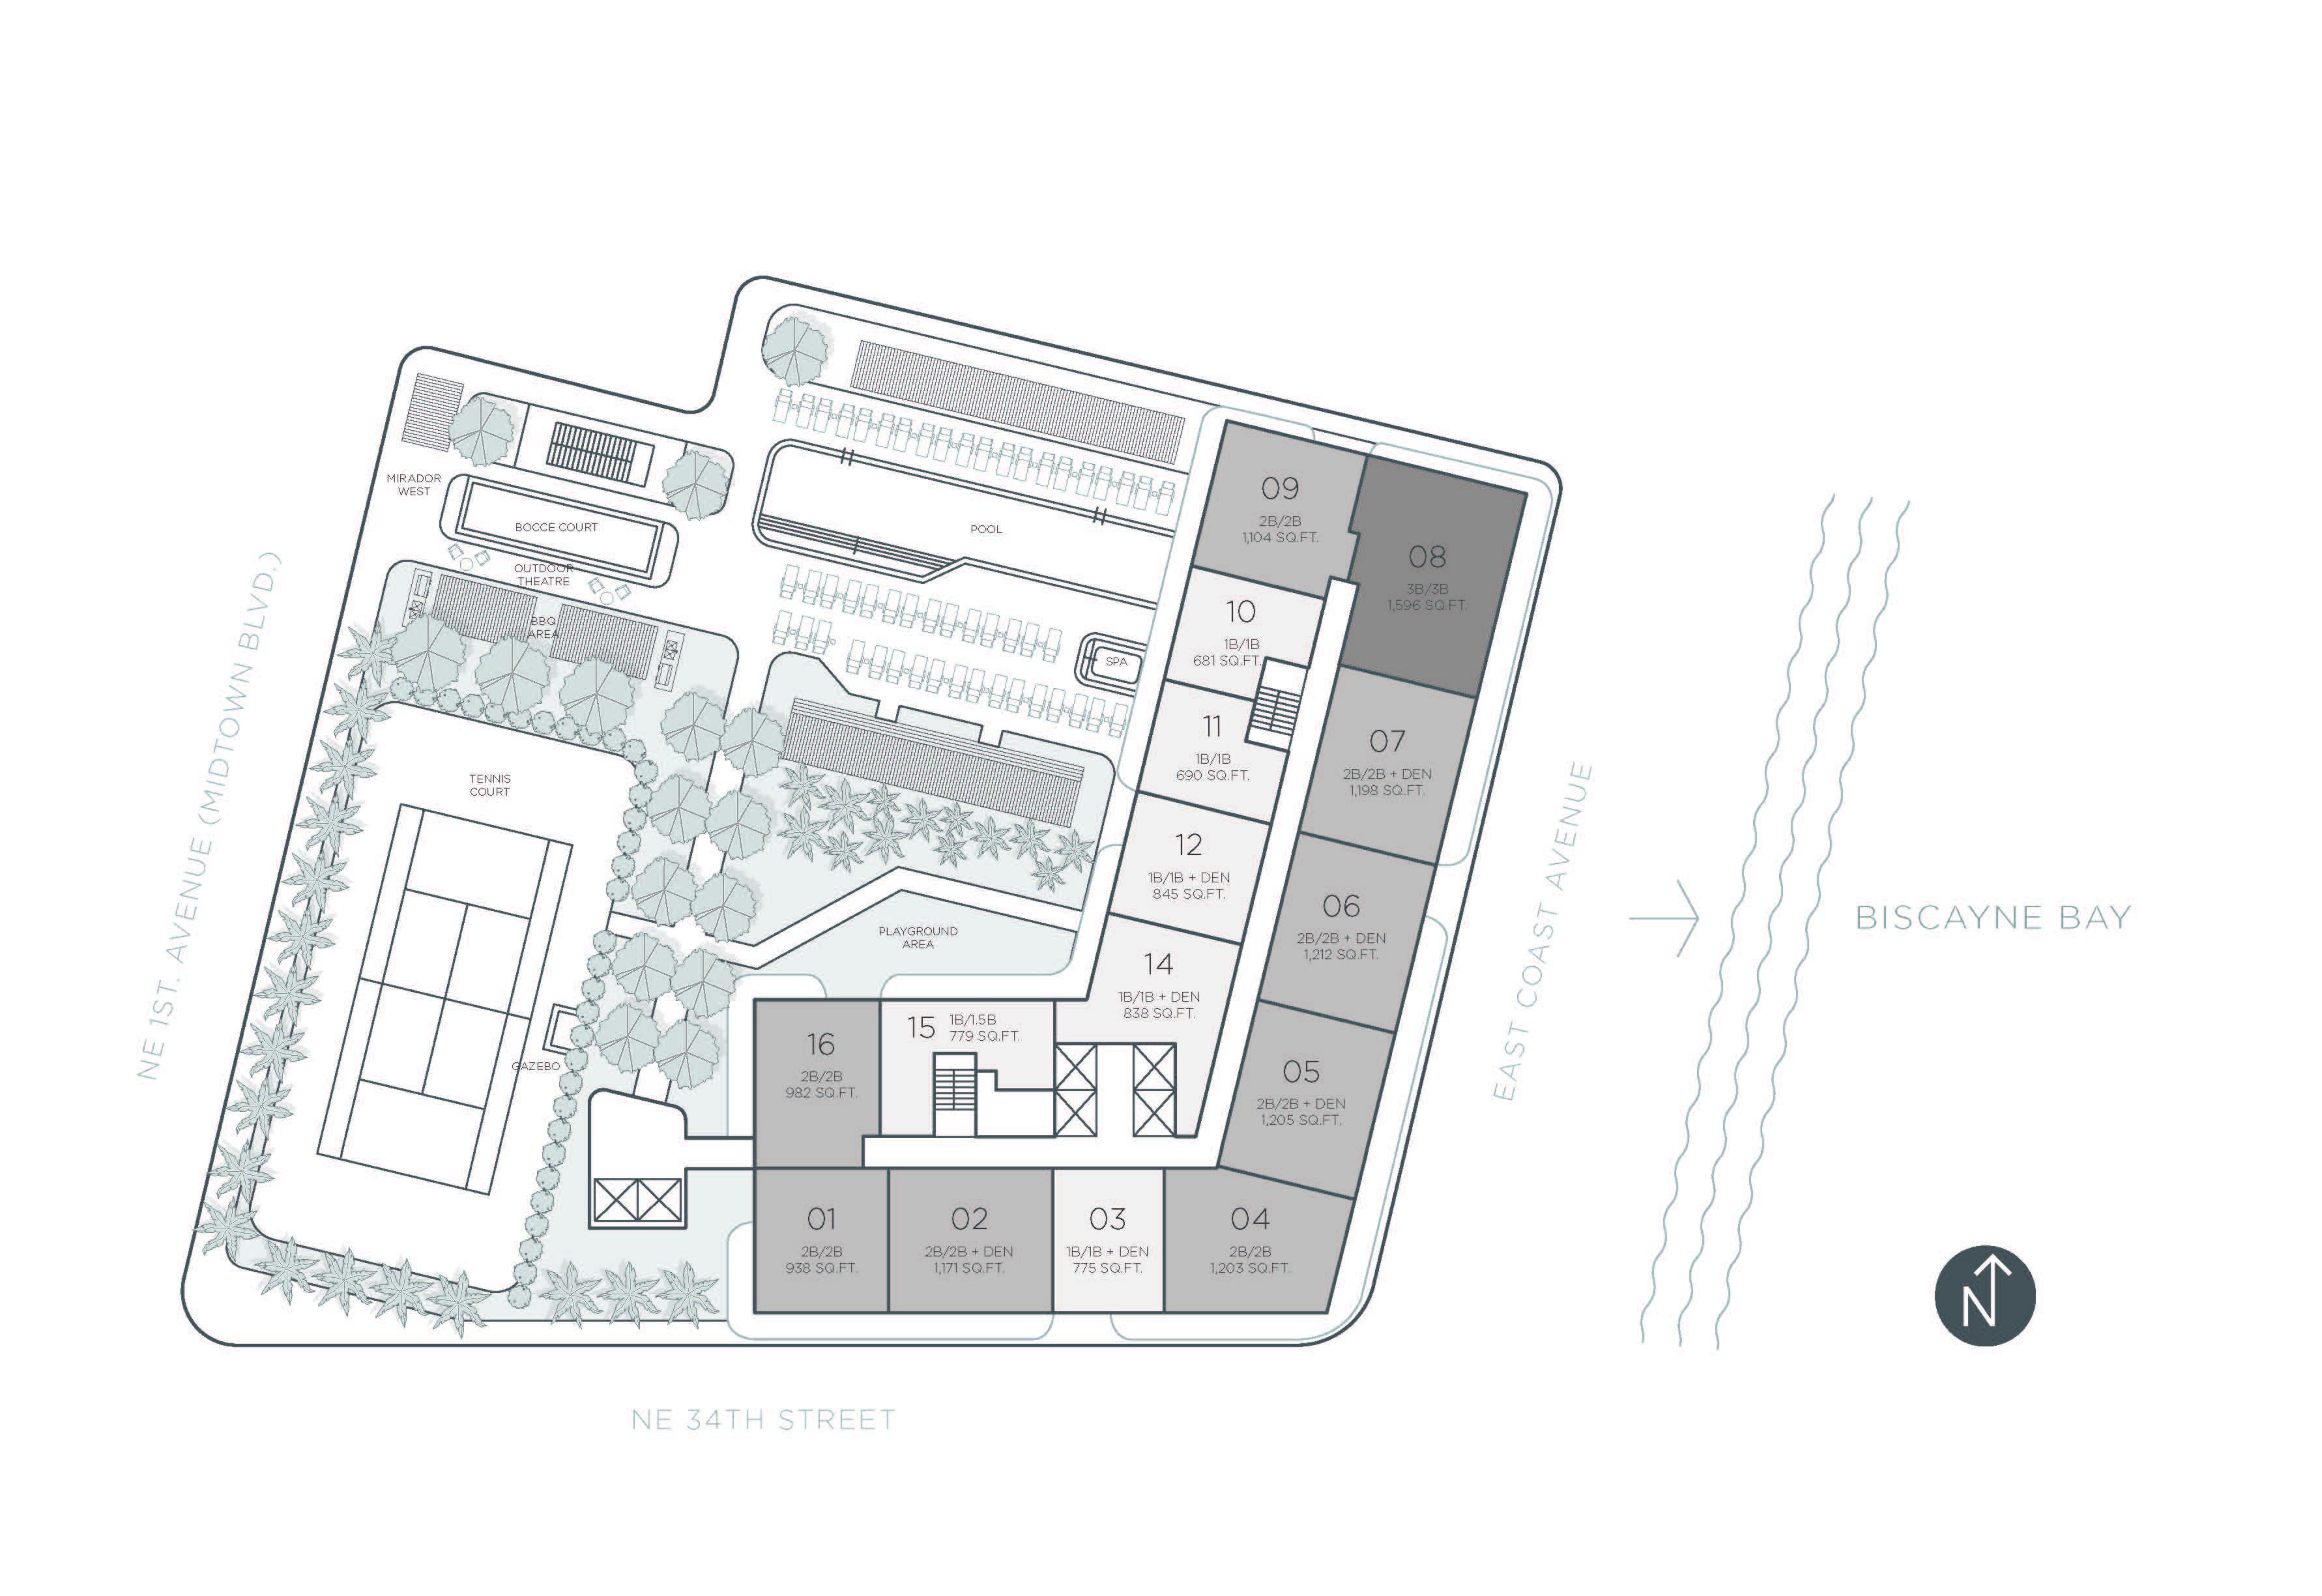 hyde-midtown-tower-residences-site-plan